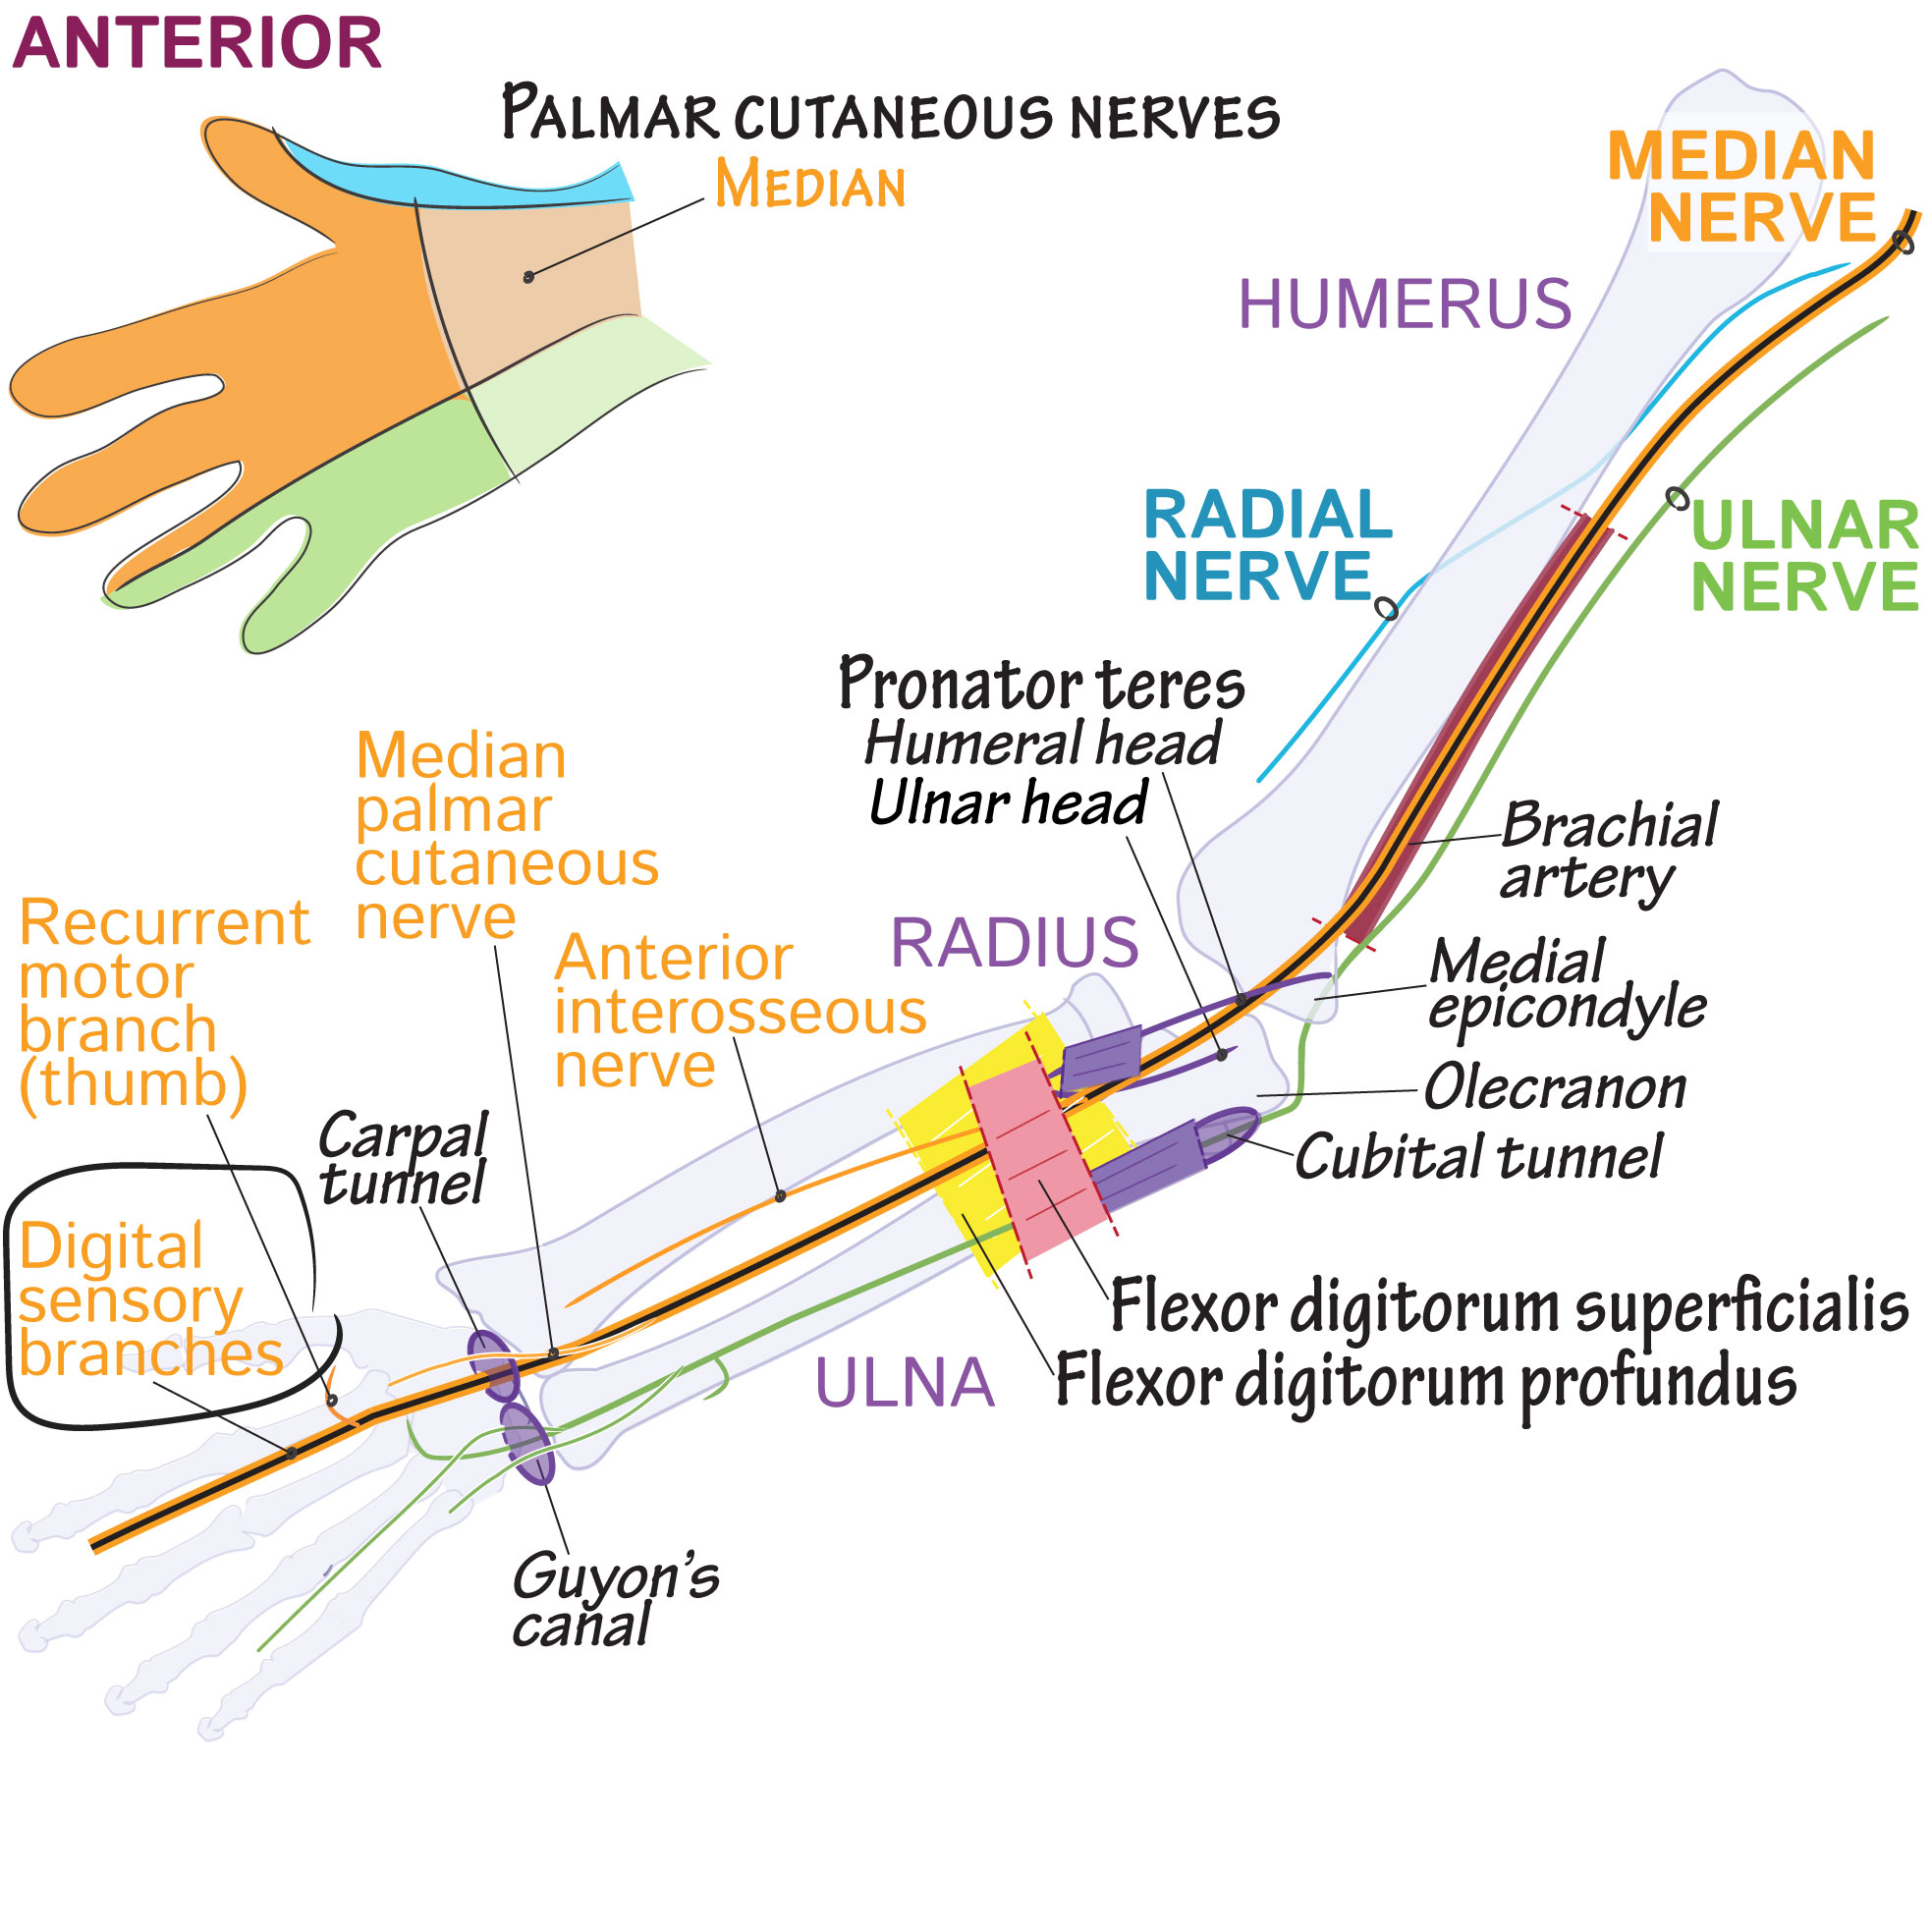 Gross Anatomy Glossary: Median nerve digital sensory branches | Draw ...